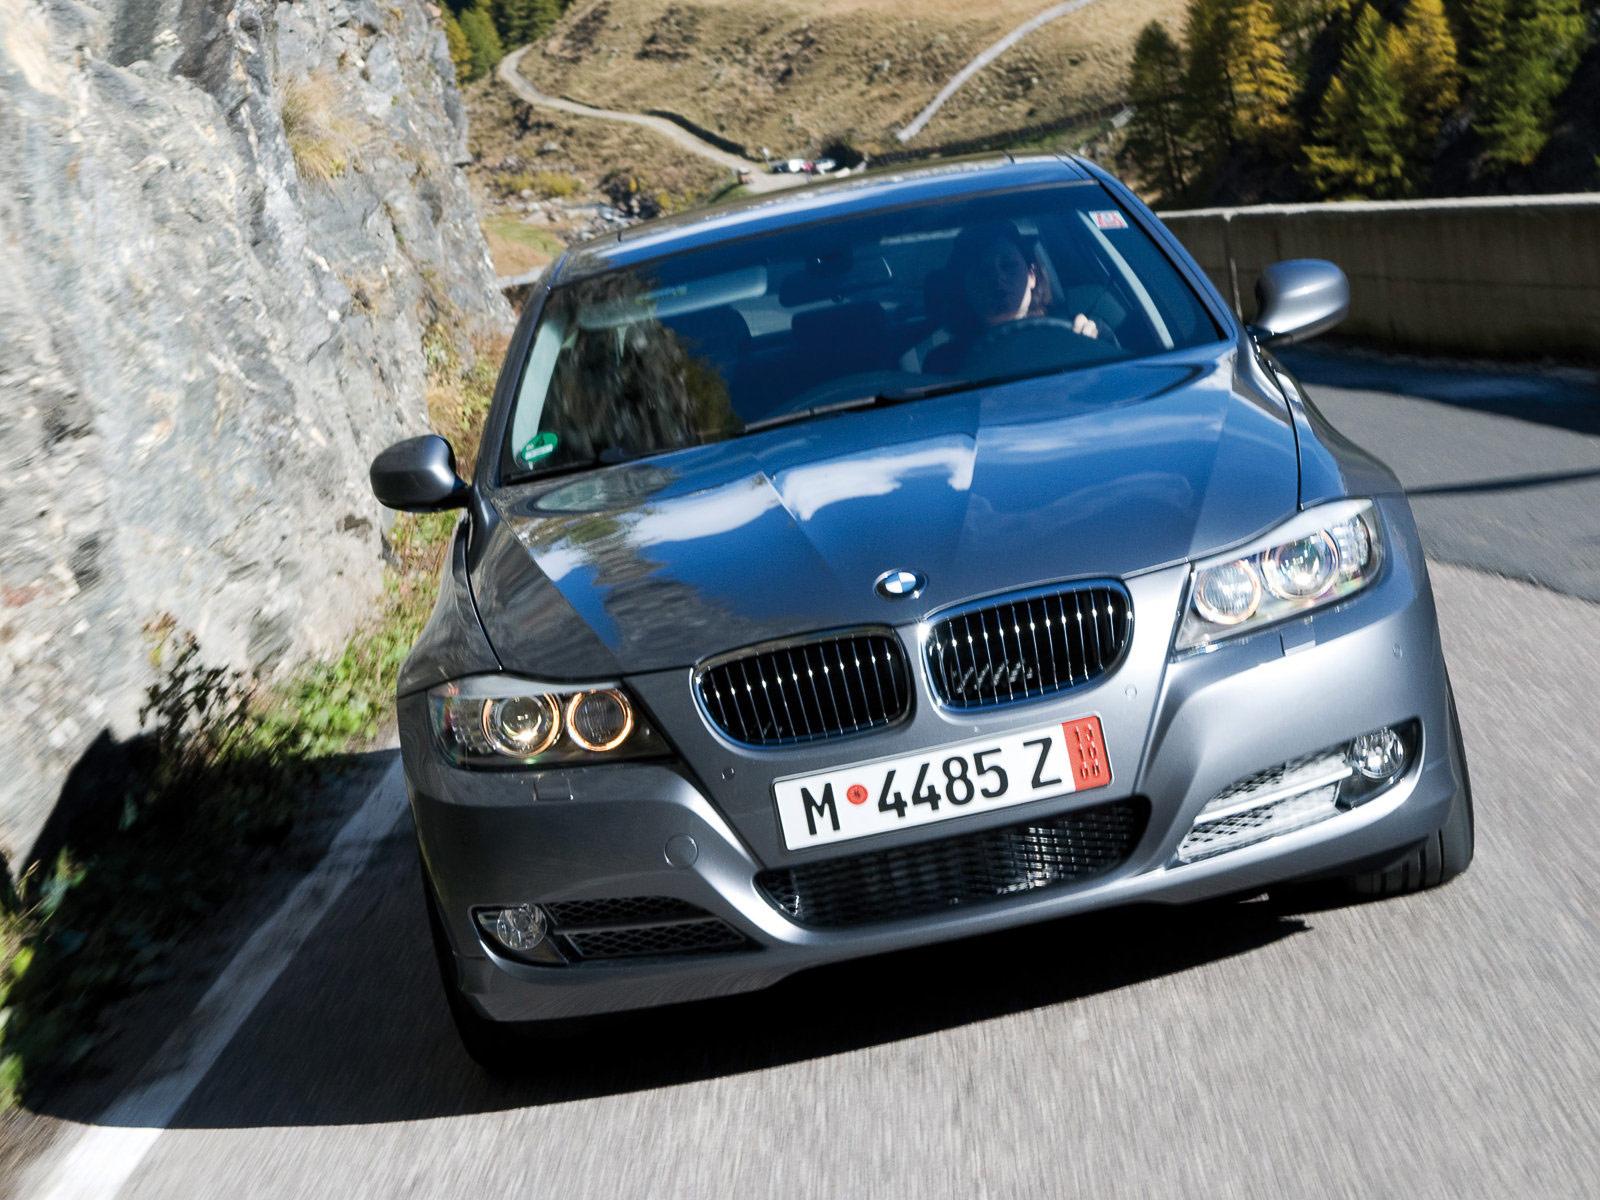 2009 BMW 335d BluePerformance desktop wallpaper - Auto Trends Magazine